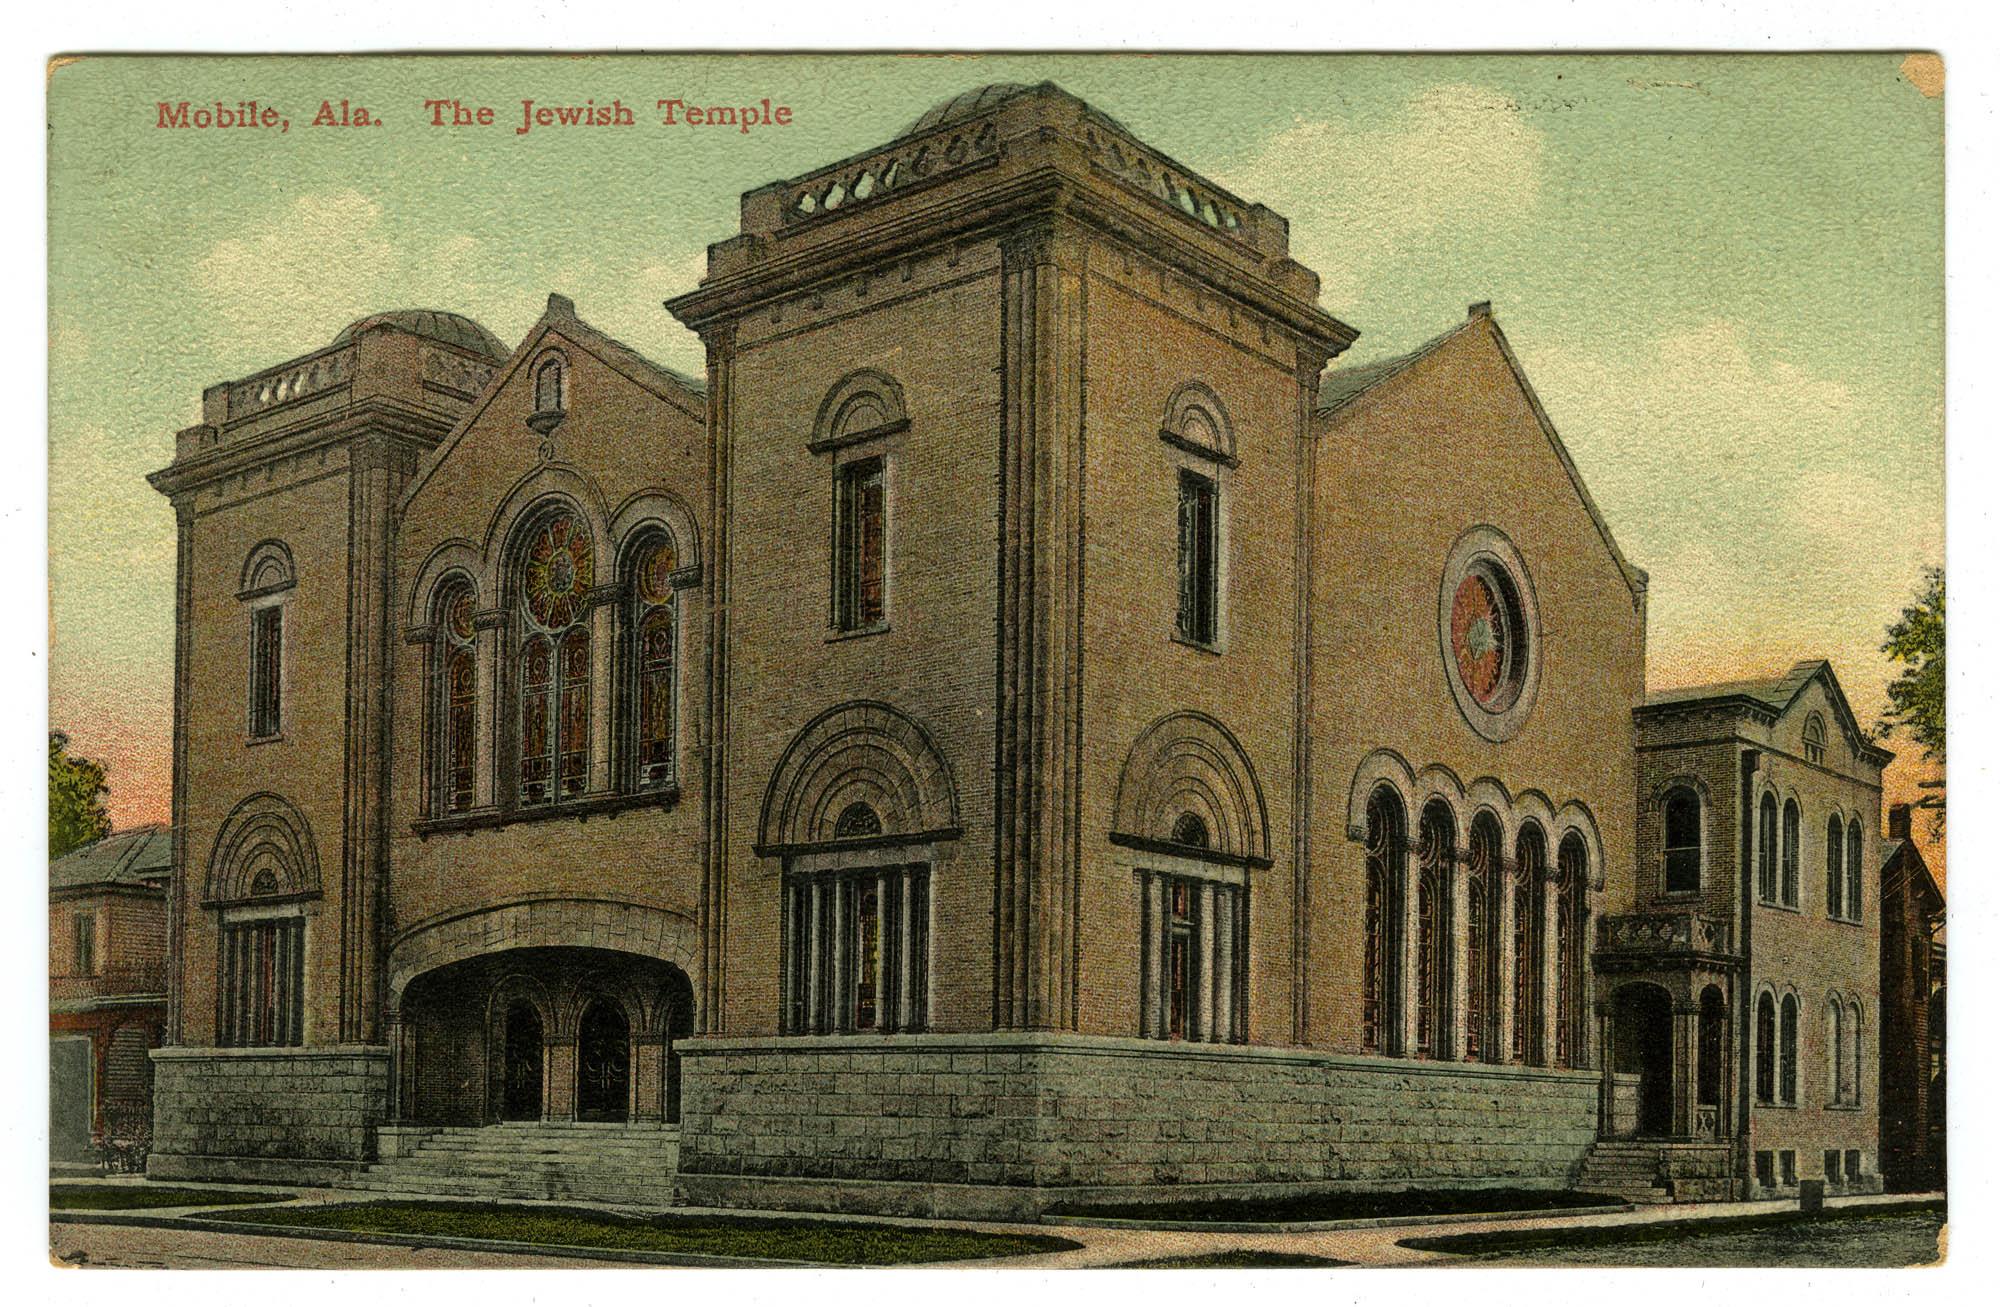 The Jewish Temple, Mobile, Ala.